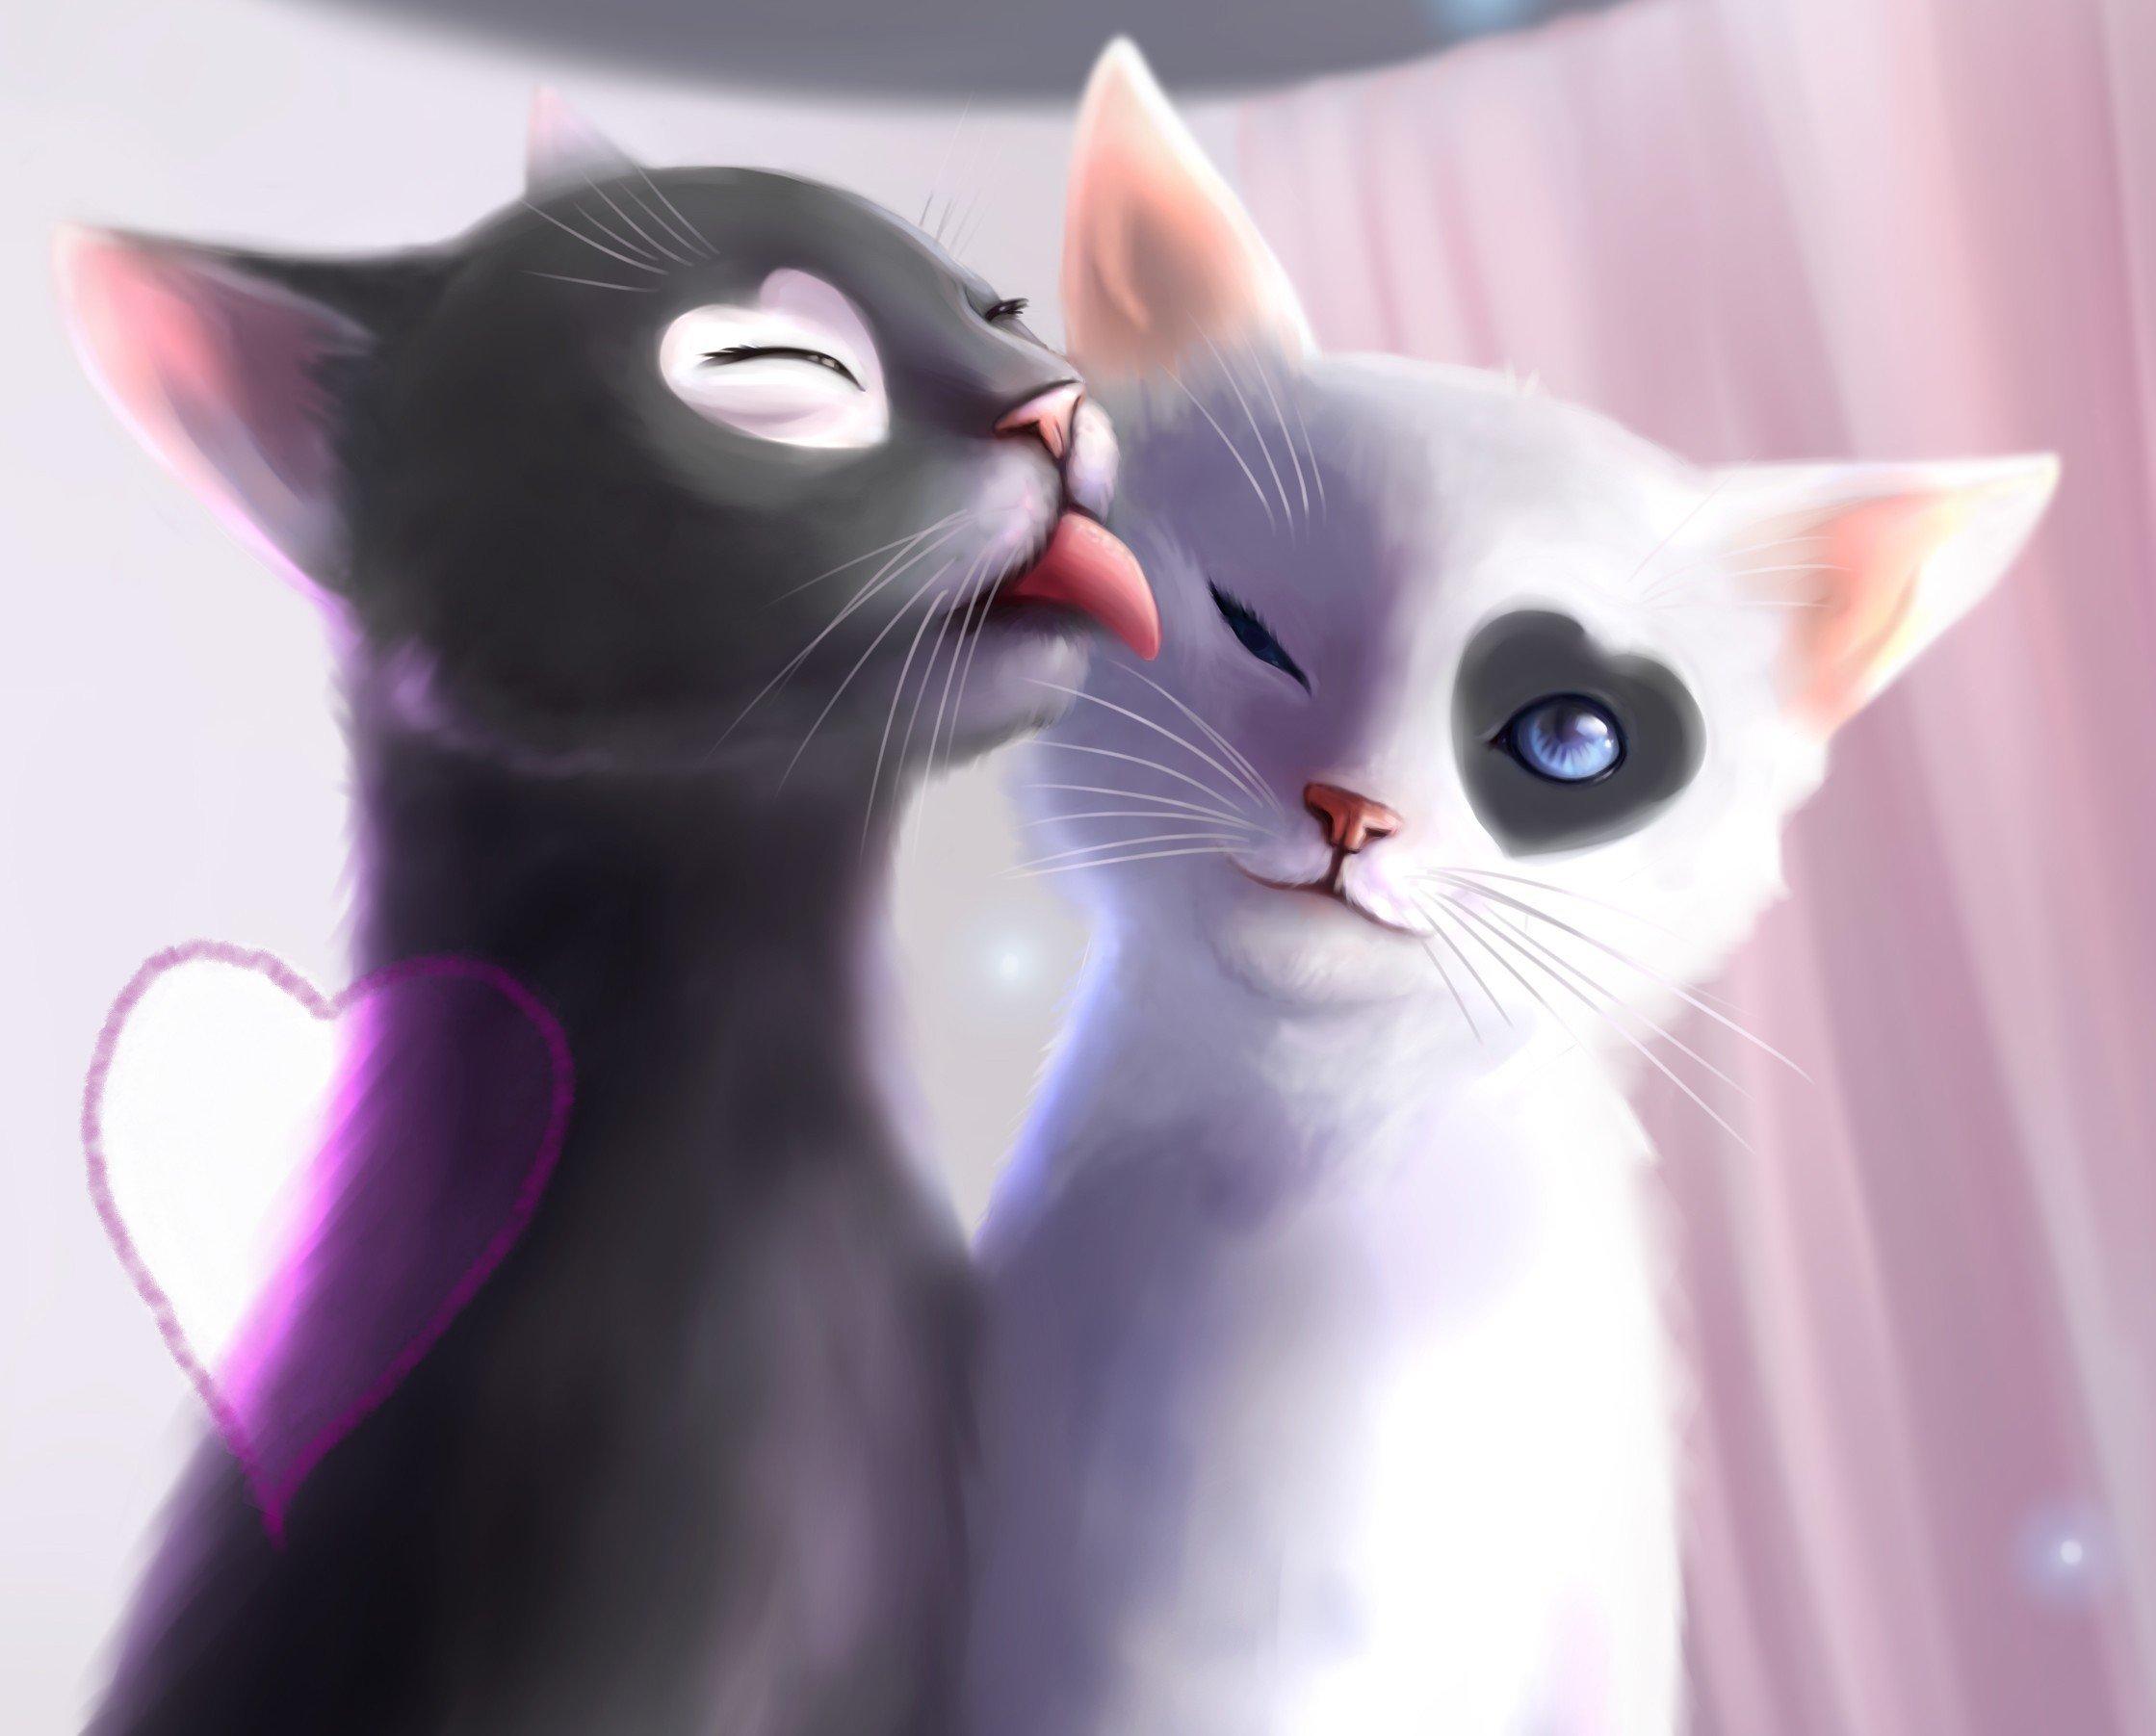 Love Wallpaper Drawing : cute cat Drawings Wallpaper - WallpaperSafari